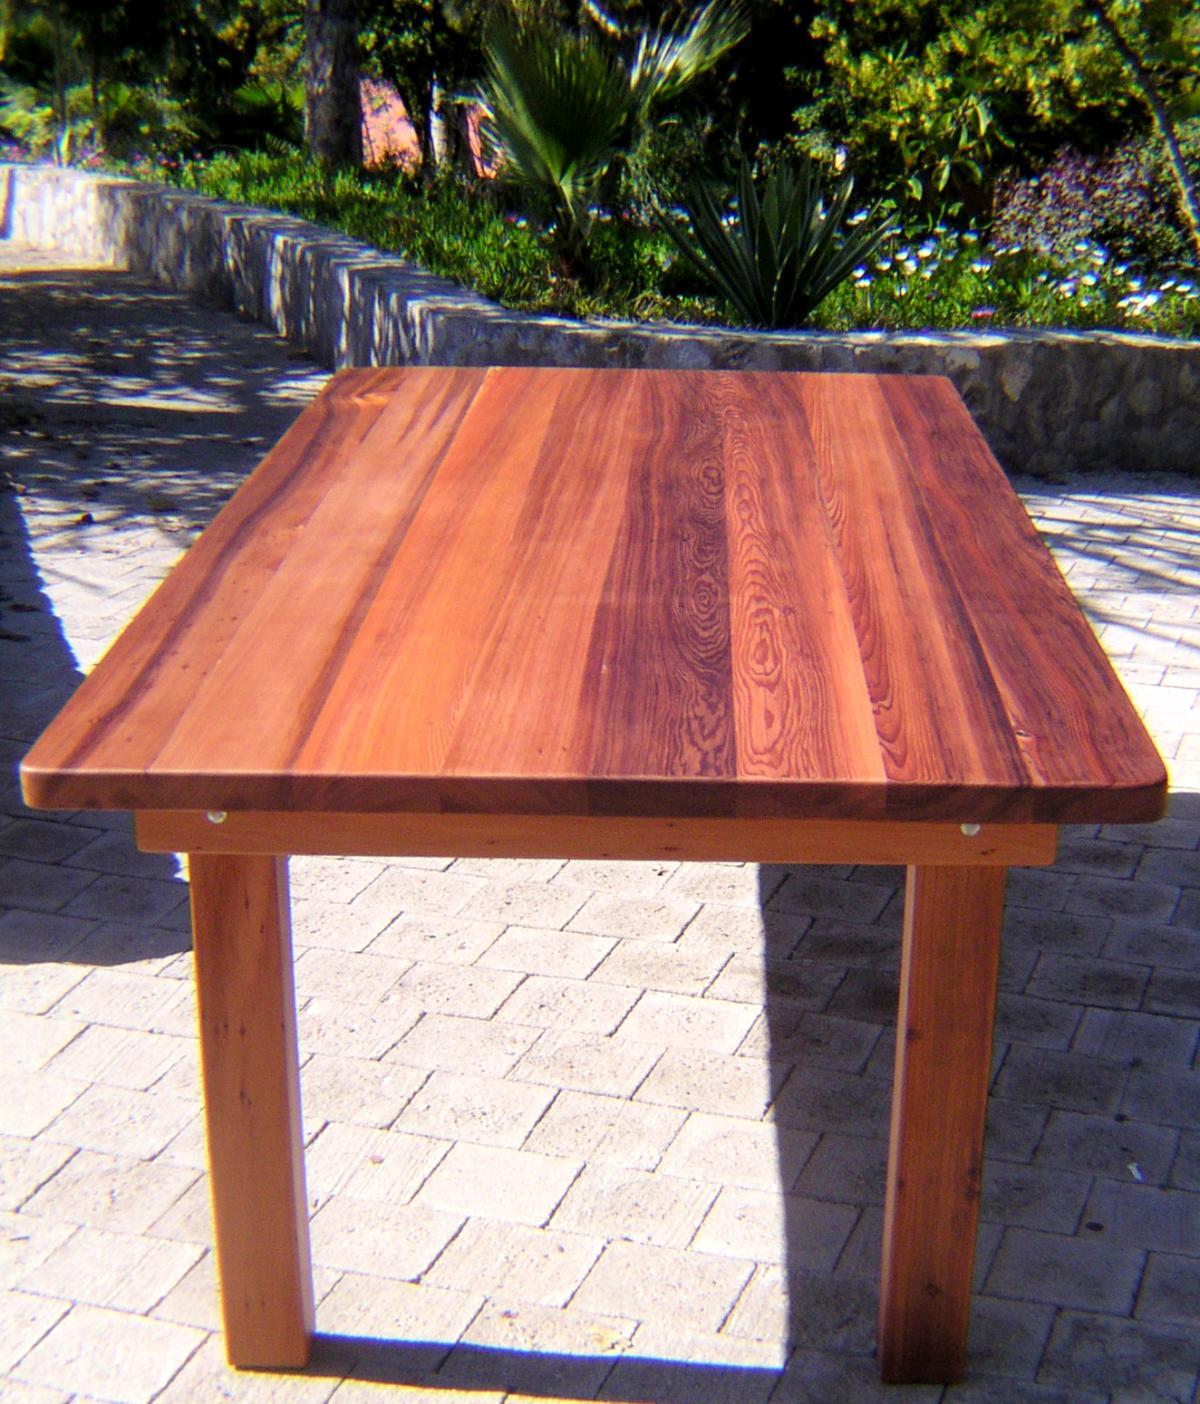 Redwood Log Sofa Table Orlando: Redwood Patio Table: Custom Made Redwood Dining Tables